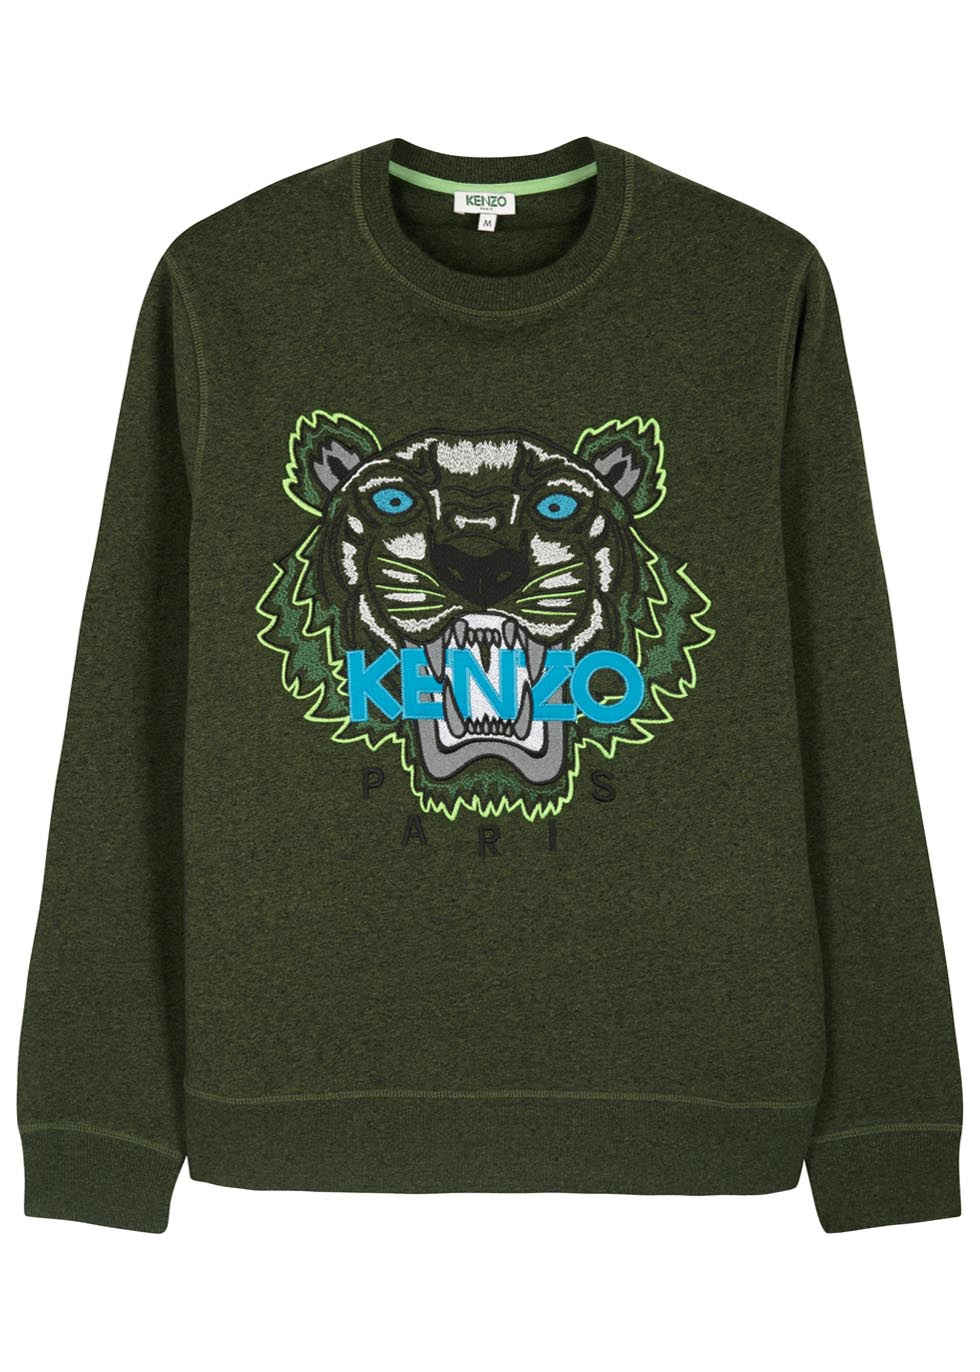 6297d1536 KENZO Green Tiger Cotton Sweatshirt in Green for Men - Lyst